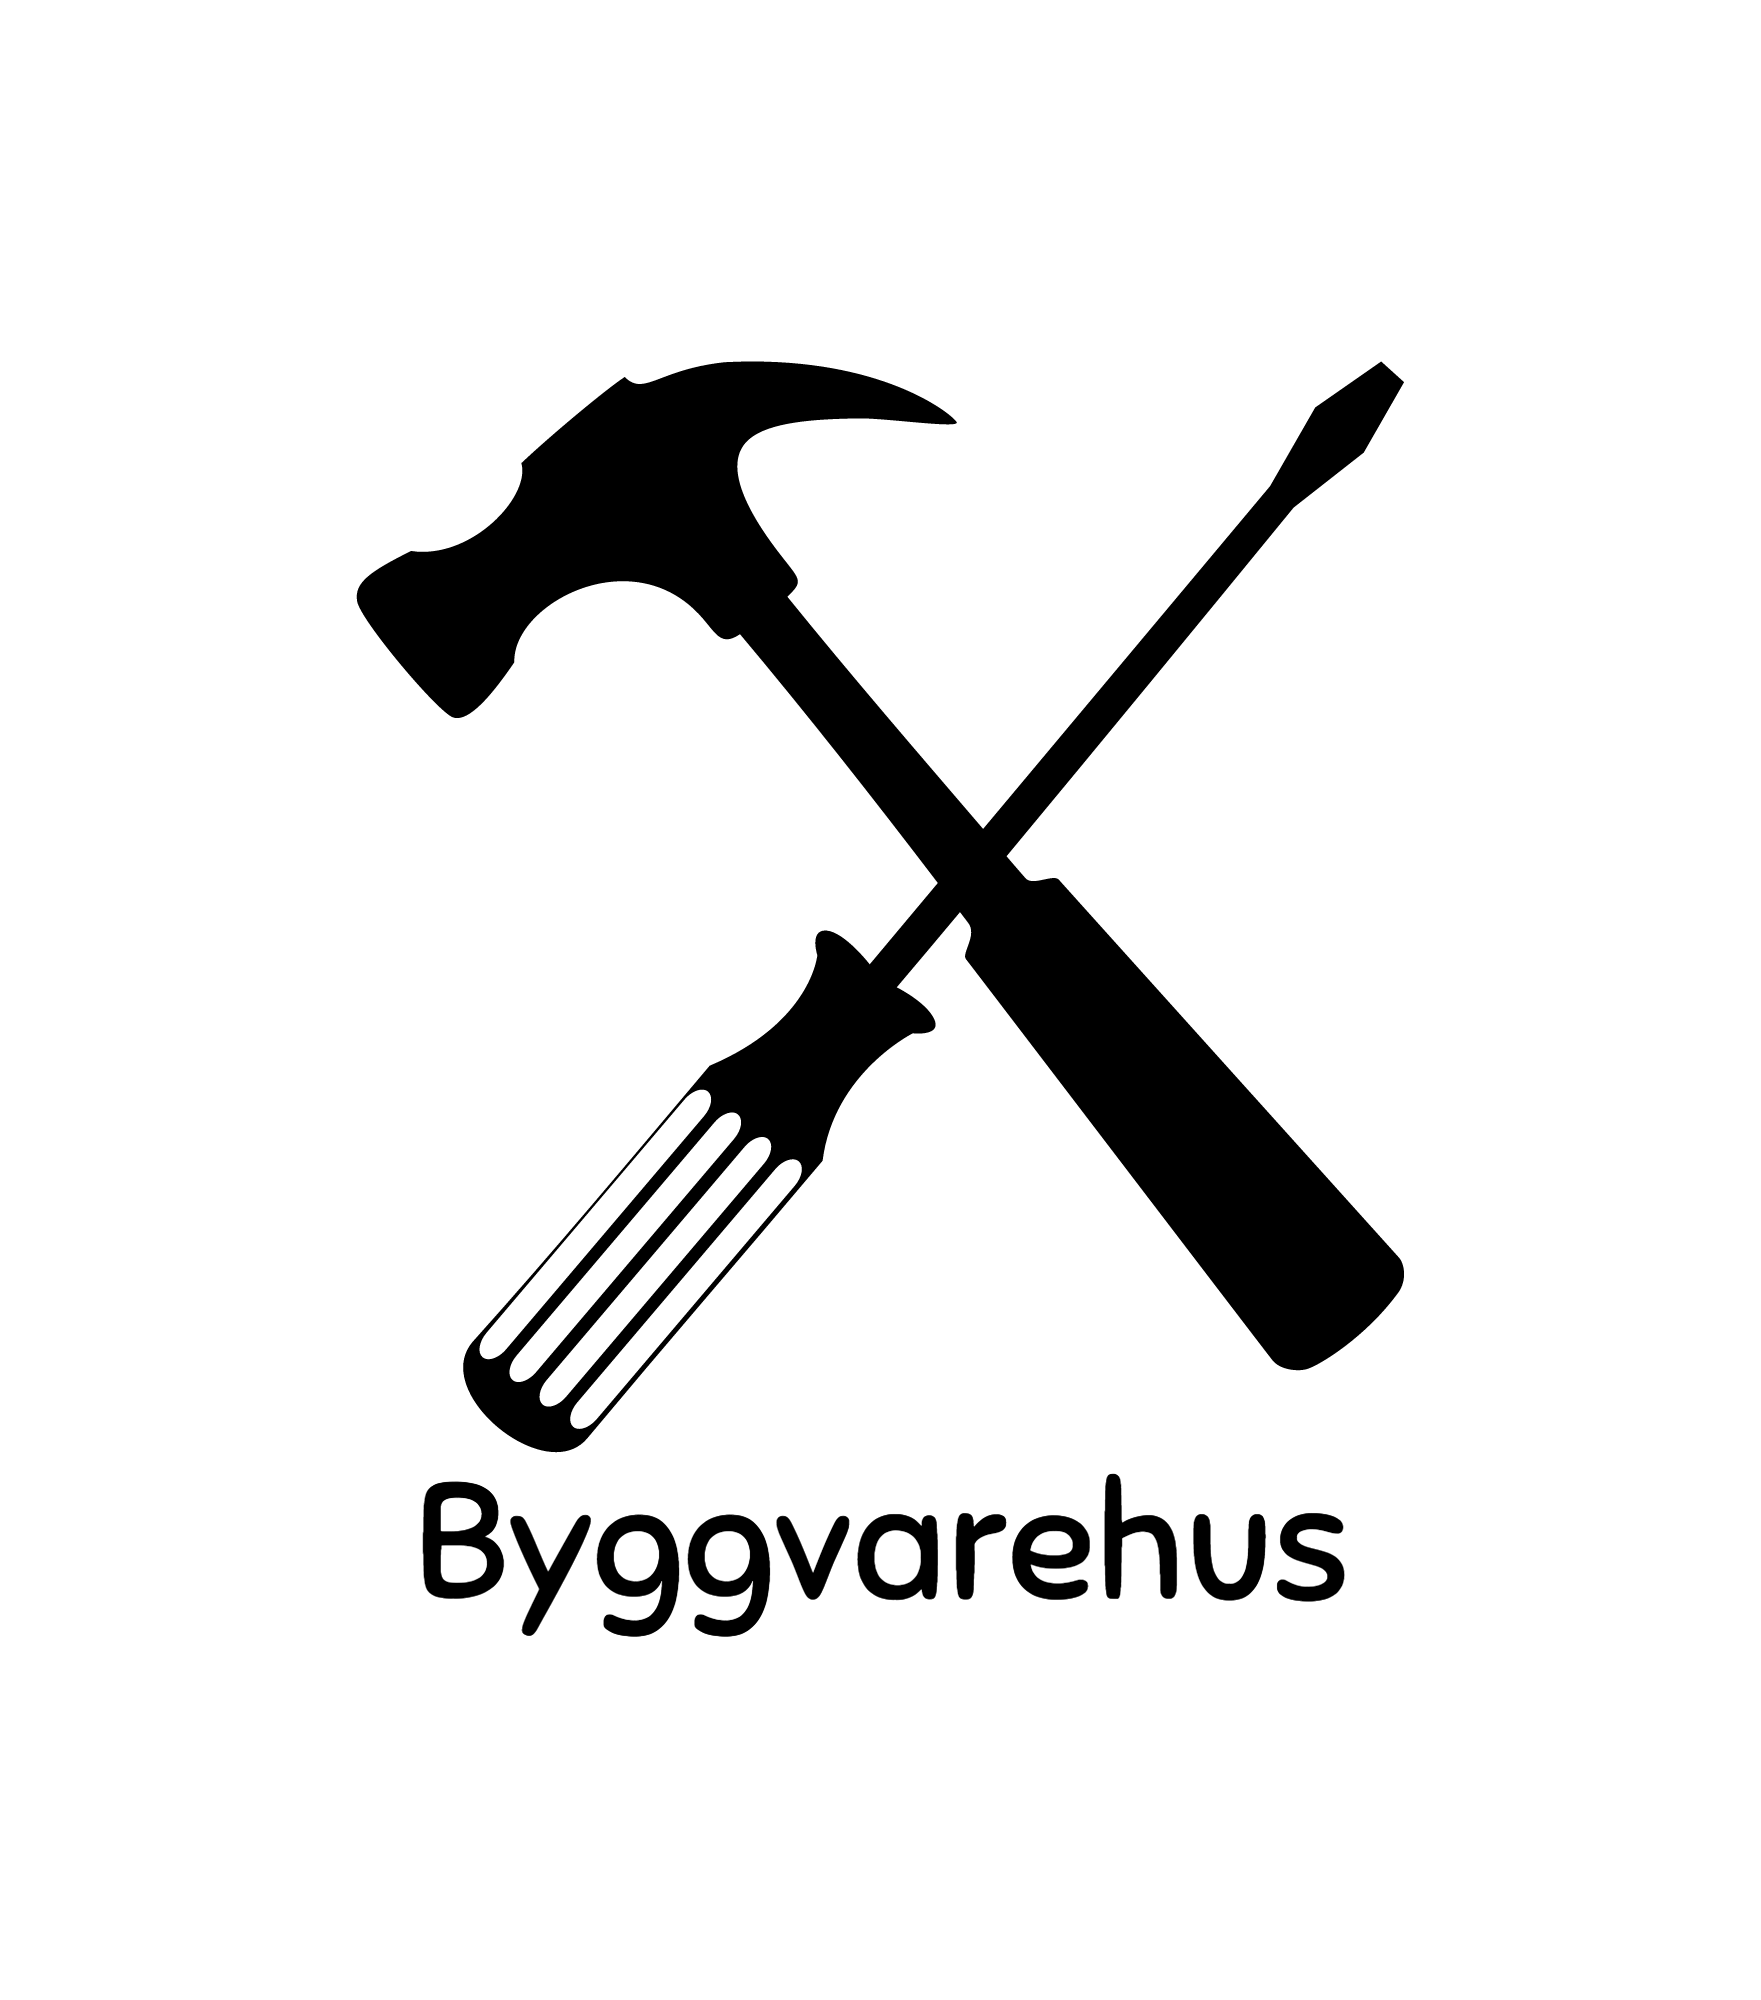 Byggvarehus-logo-black.png